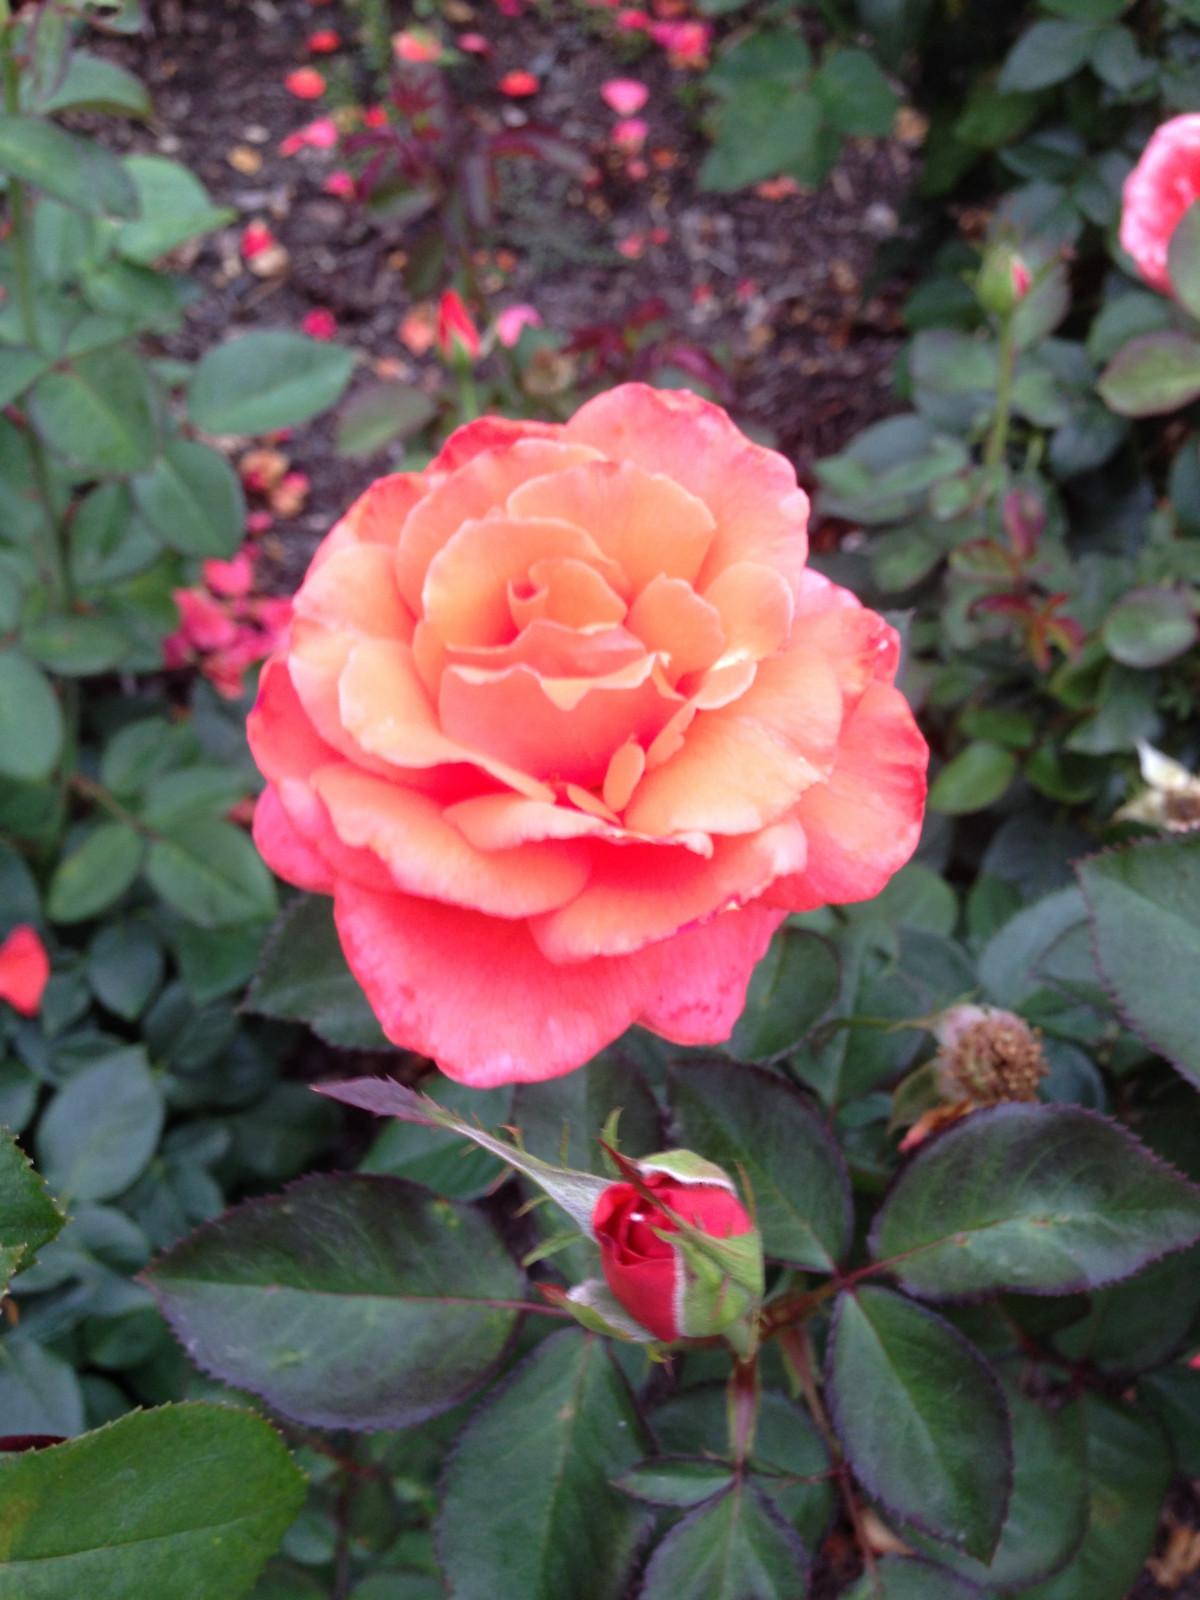 kostenlose foto blume bl tenblatt rosen strauch floribunda bl hende pflanze gartenrosen. Black Bedroom Furniture Sets. Home Design Ideas